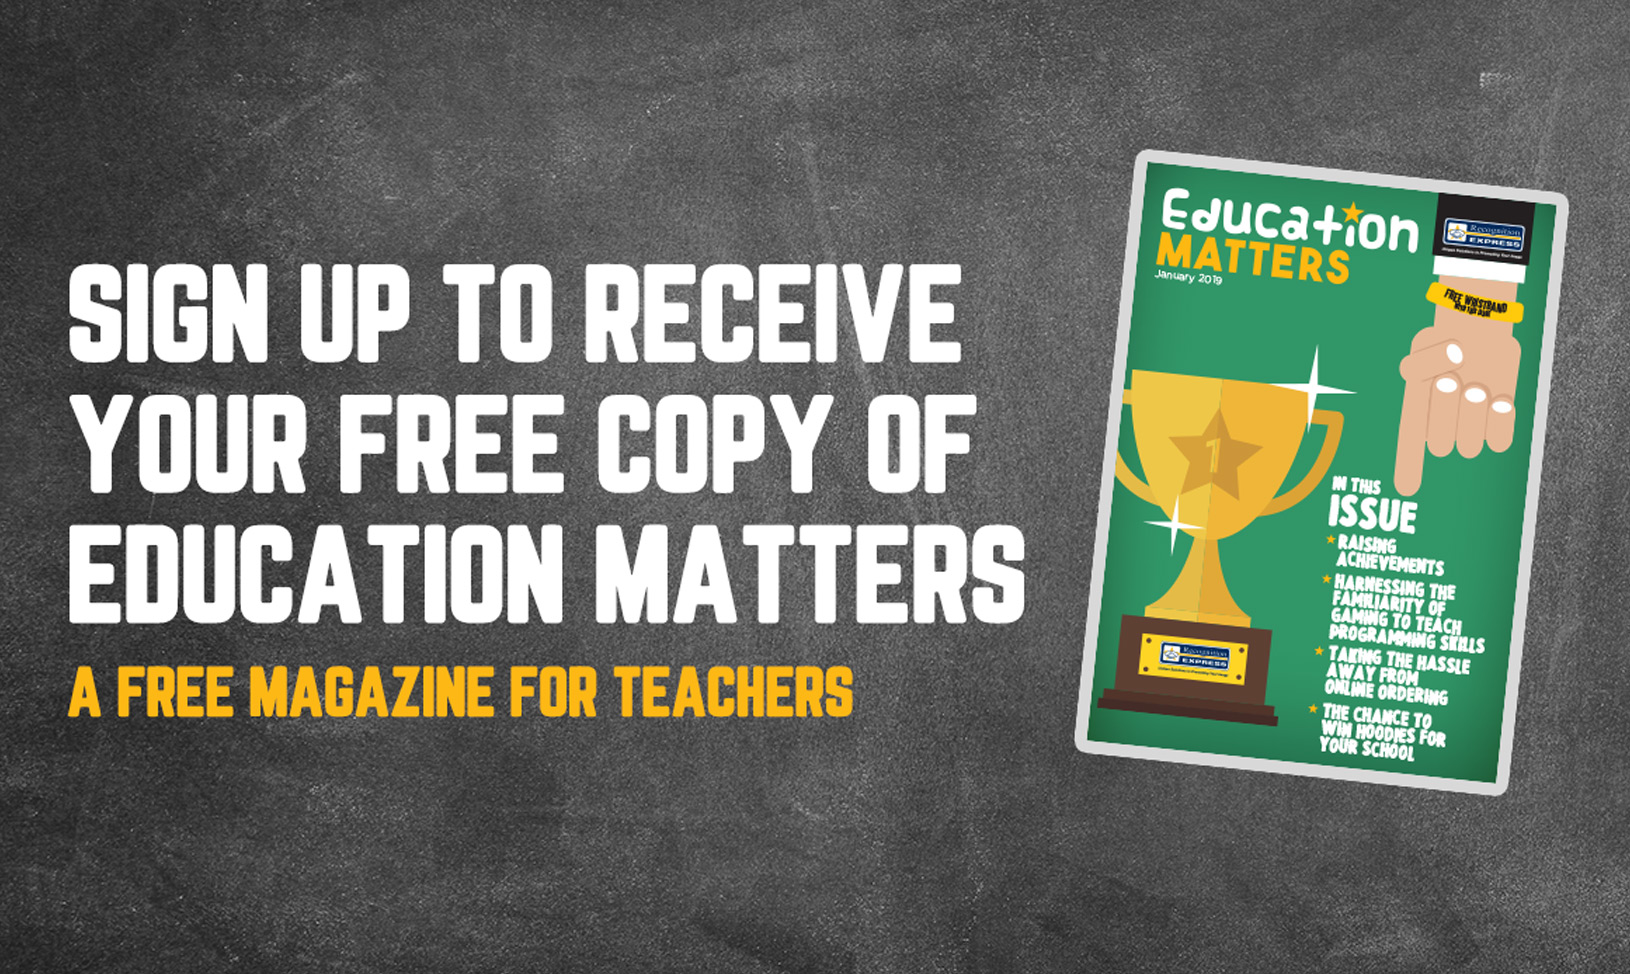 education matters free